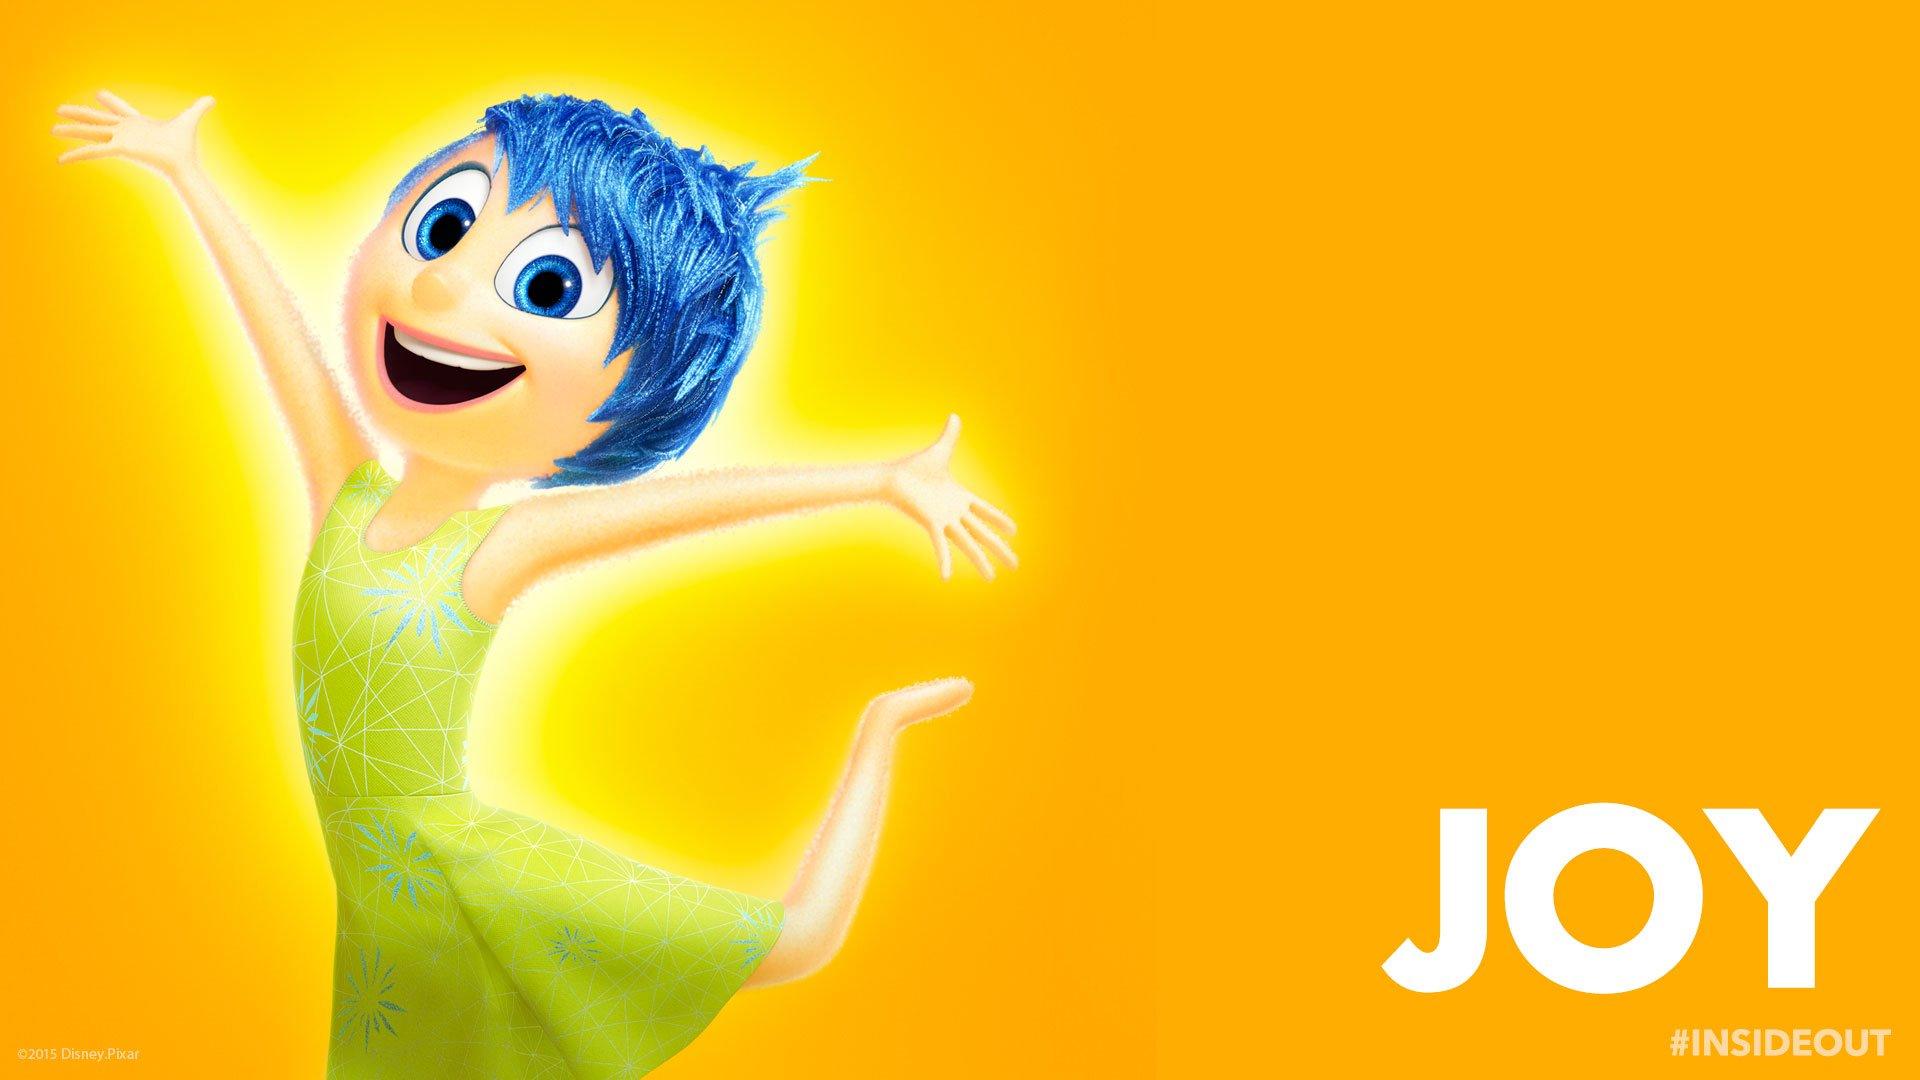 Disney Movie Inside Out 2015 Desktop Backgrounds Iphone 6